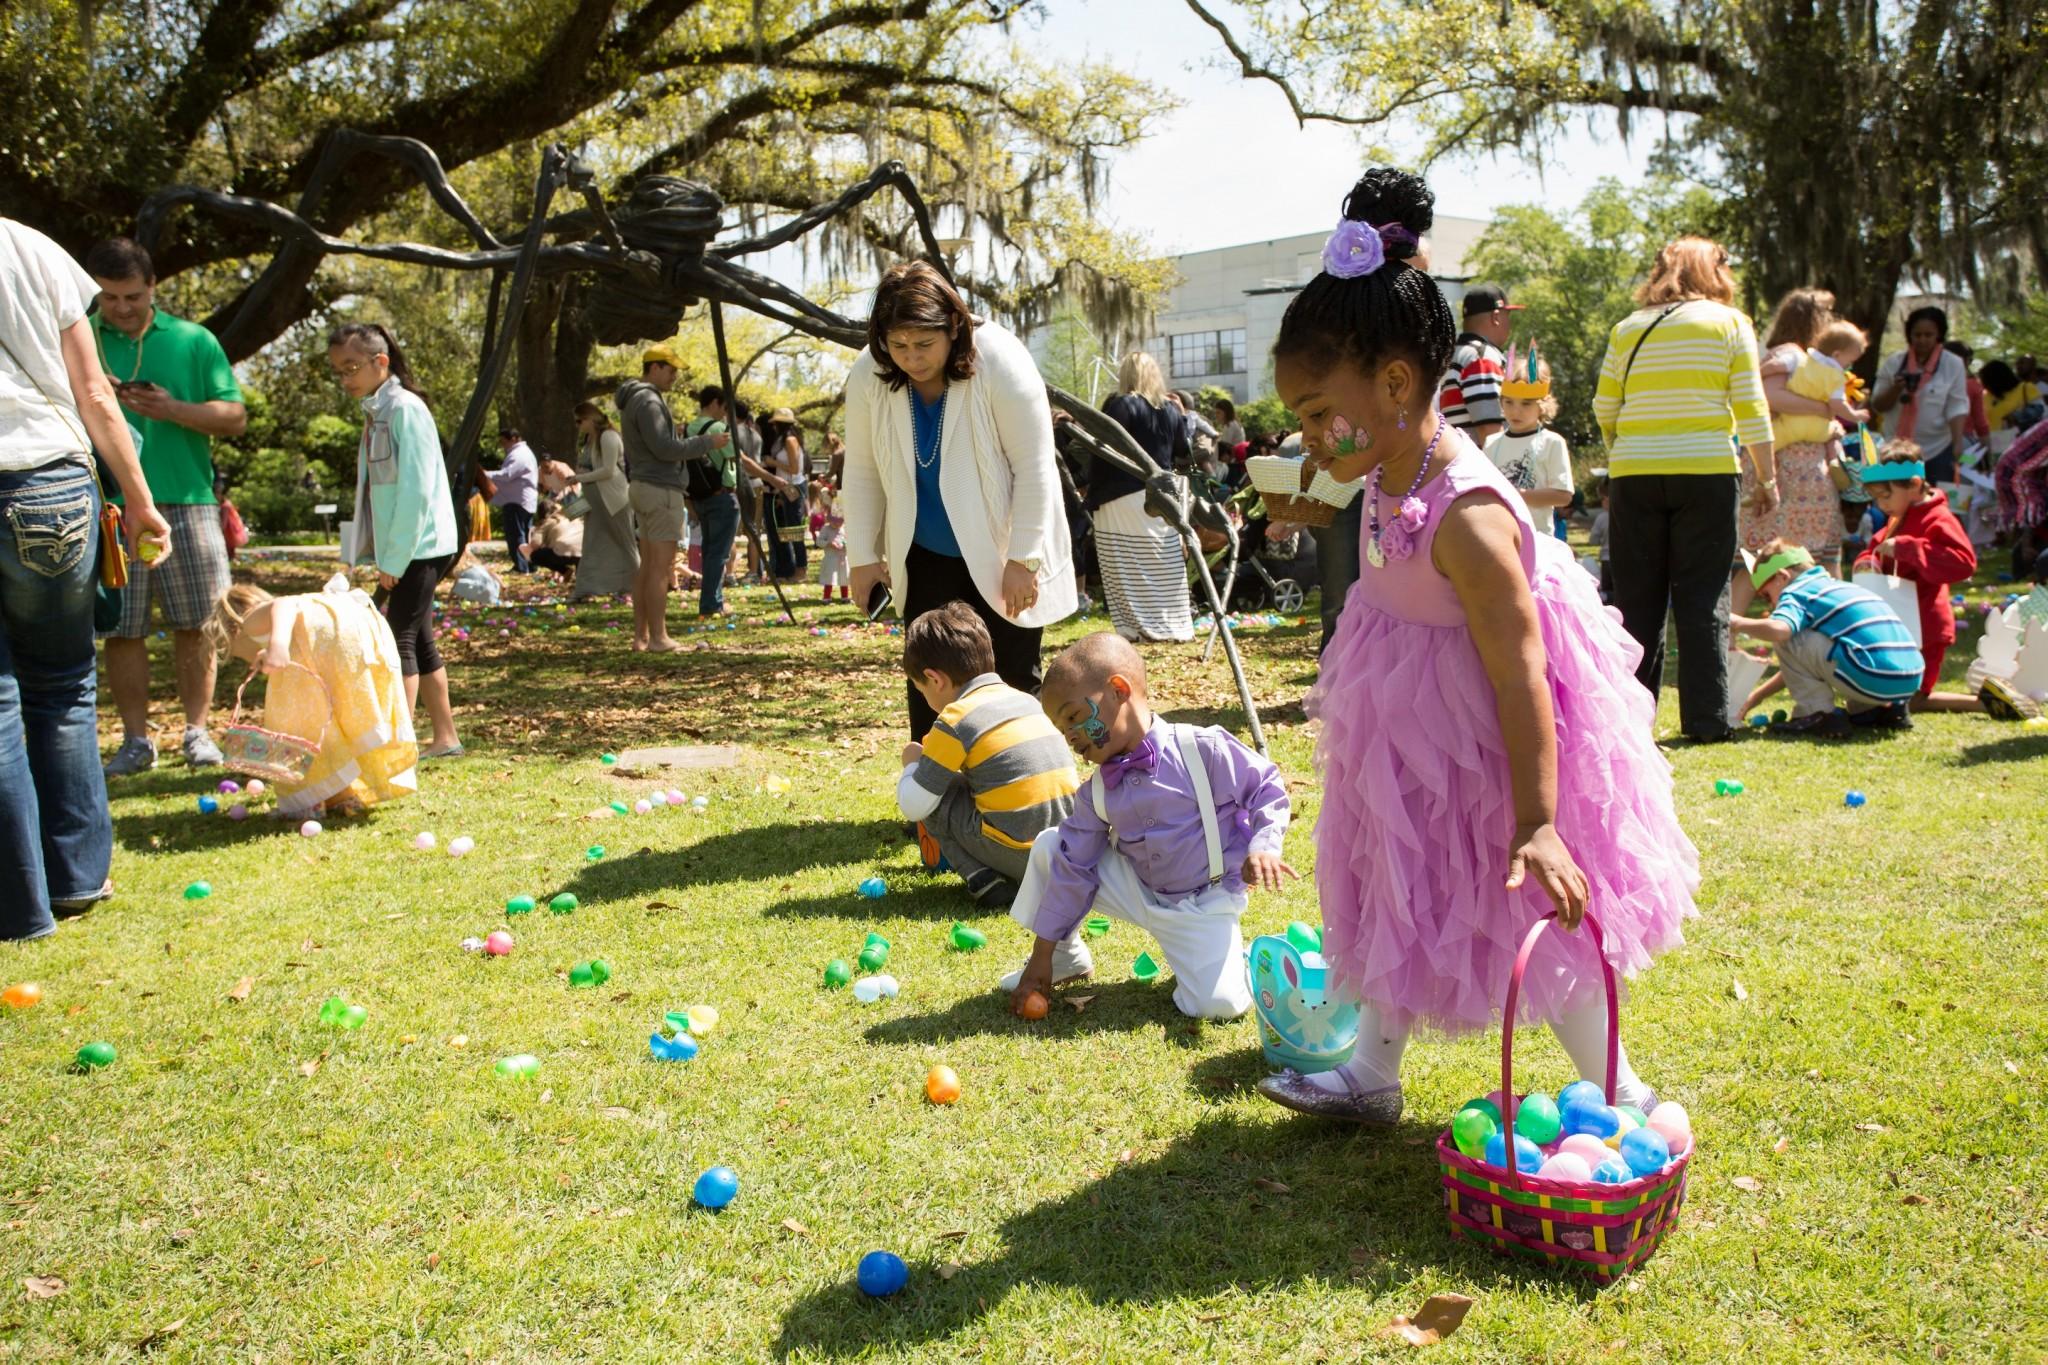 Noma Egg Hunt Family Festival Presented By Whitney Bank